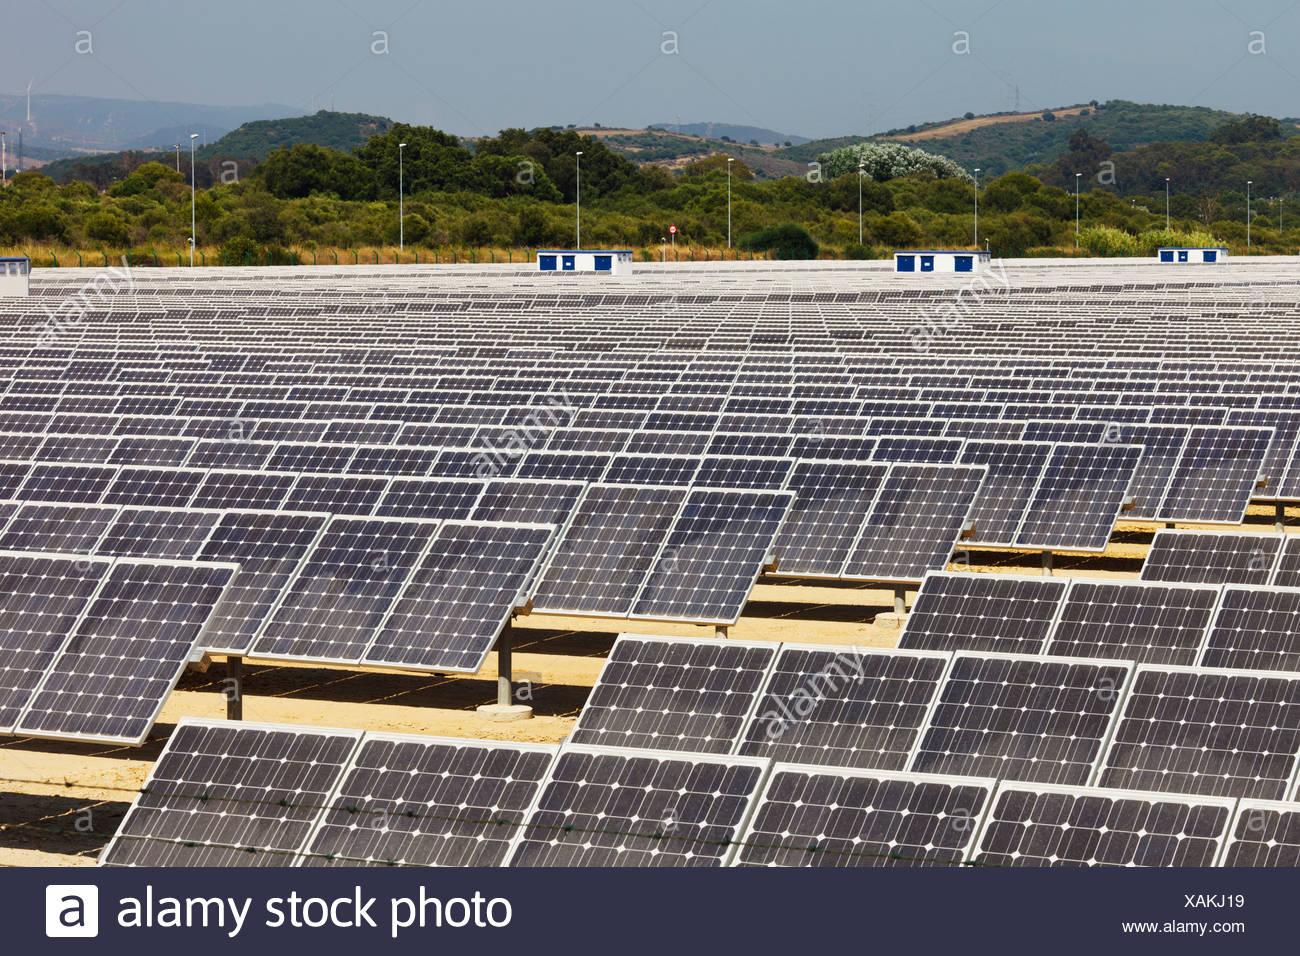 Solar Energy Centre Near Guadarranque; San Roque, Cadiz, Andalusia, Spain - Stock Image